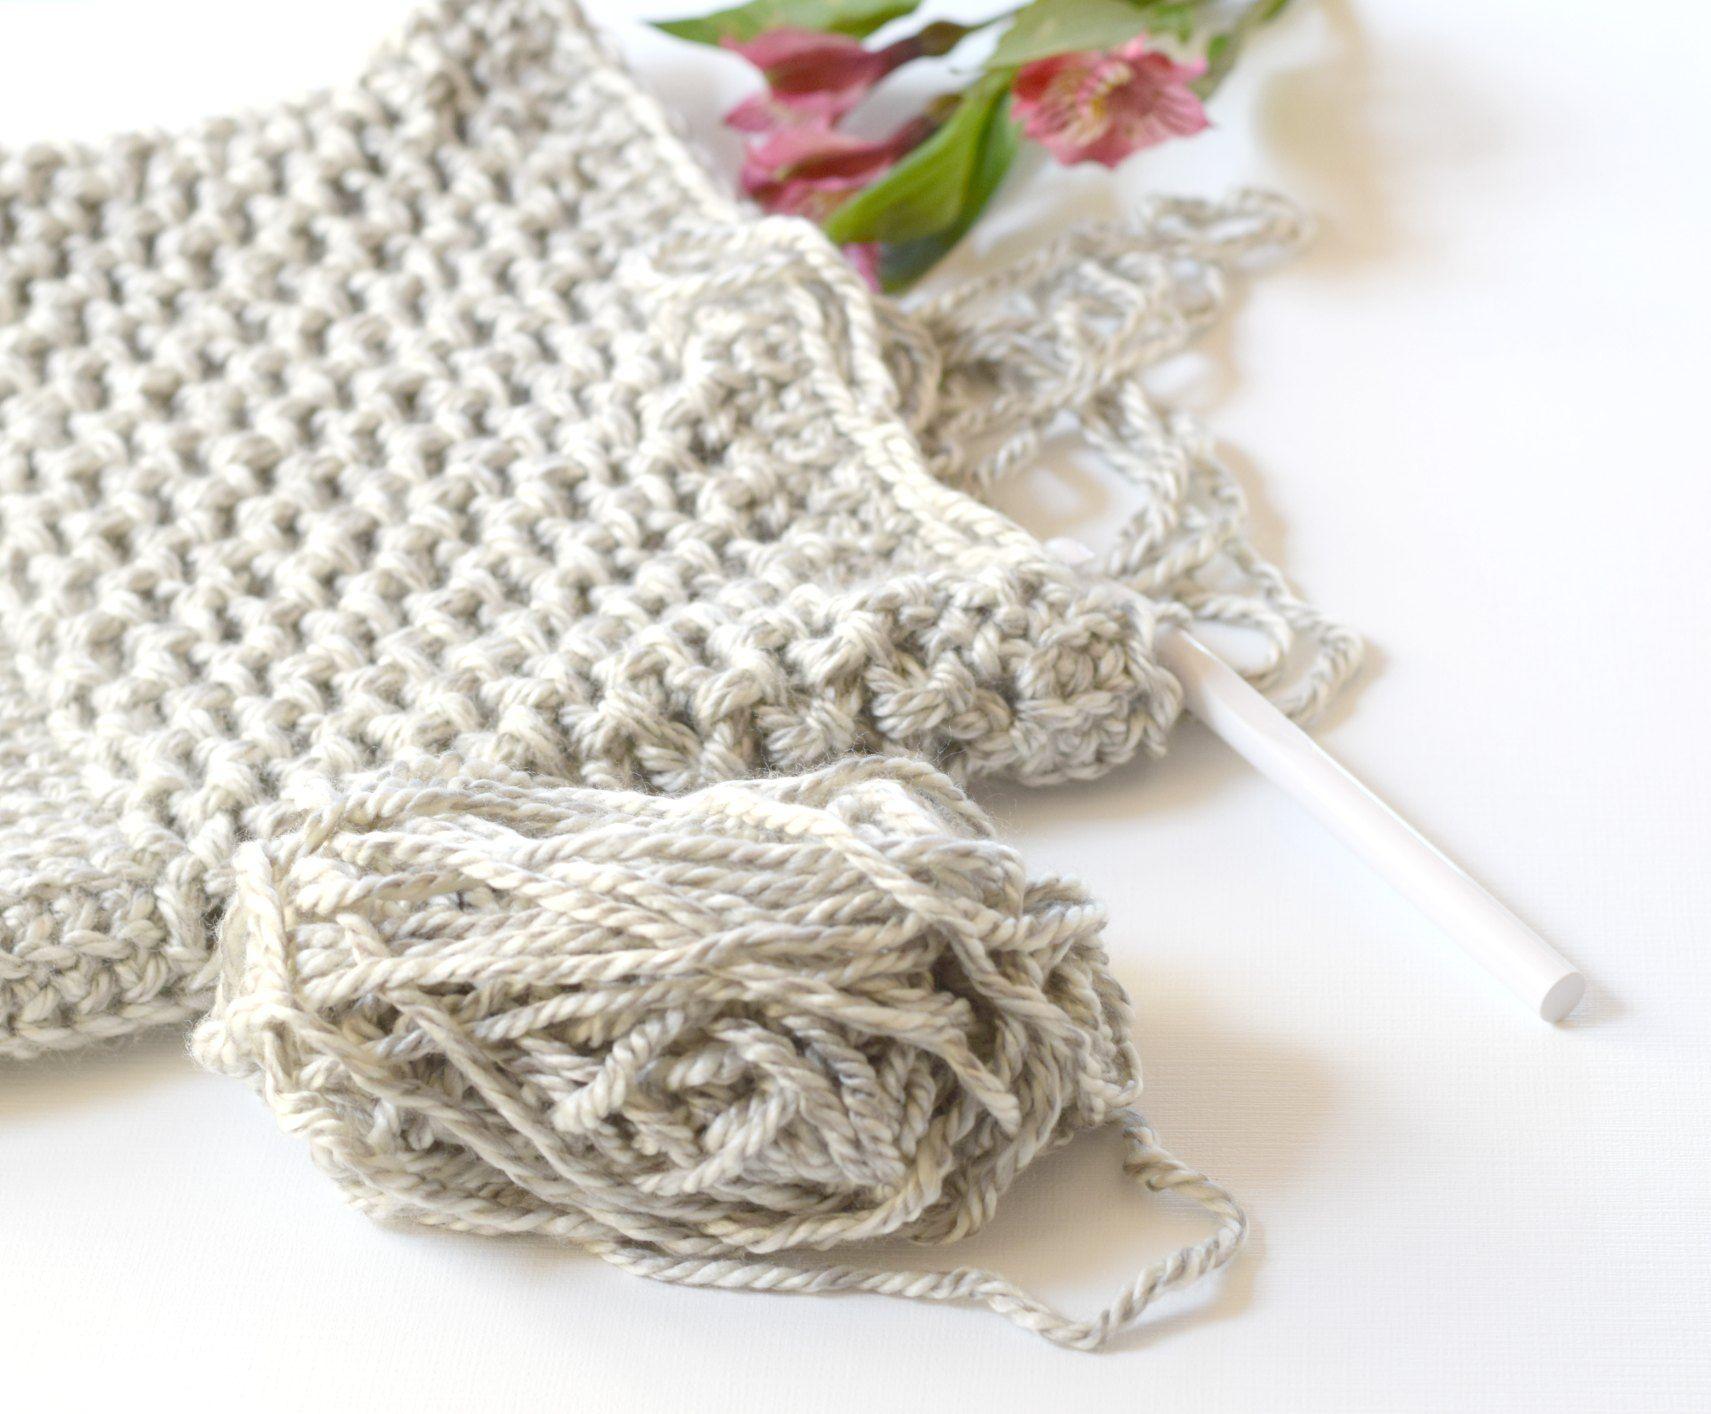 Crochet-Tote-Pattern.jpg 1.711×1.414 pixels | Crochê & Tricô | Pinterest